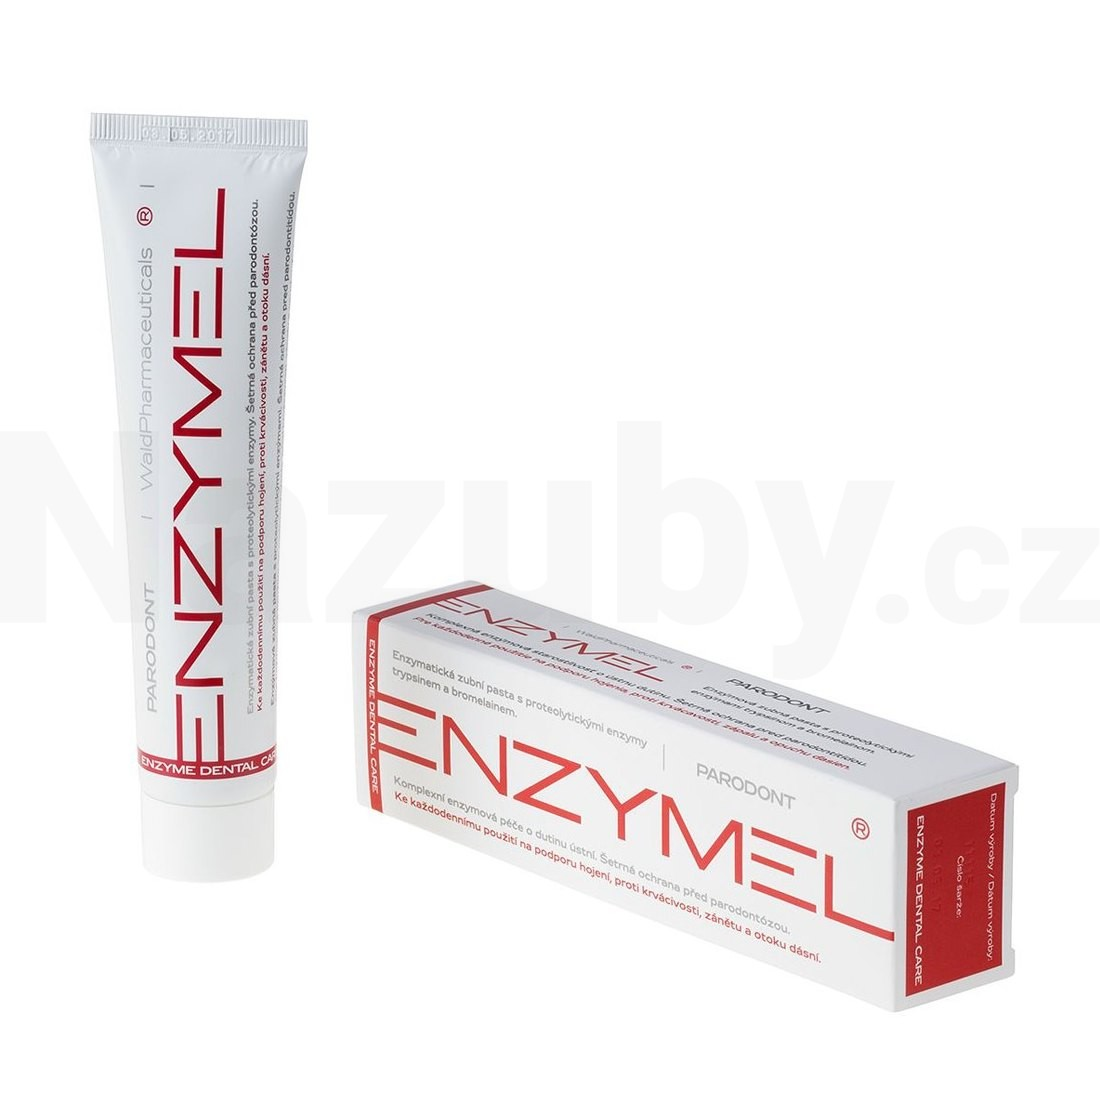 Fotografie Enzymel Parodont s aktivními enzymy 75 ml